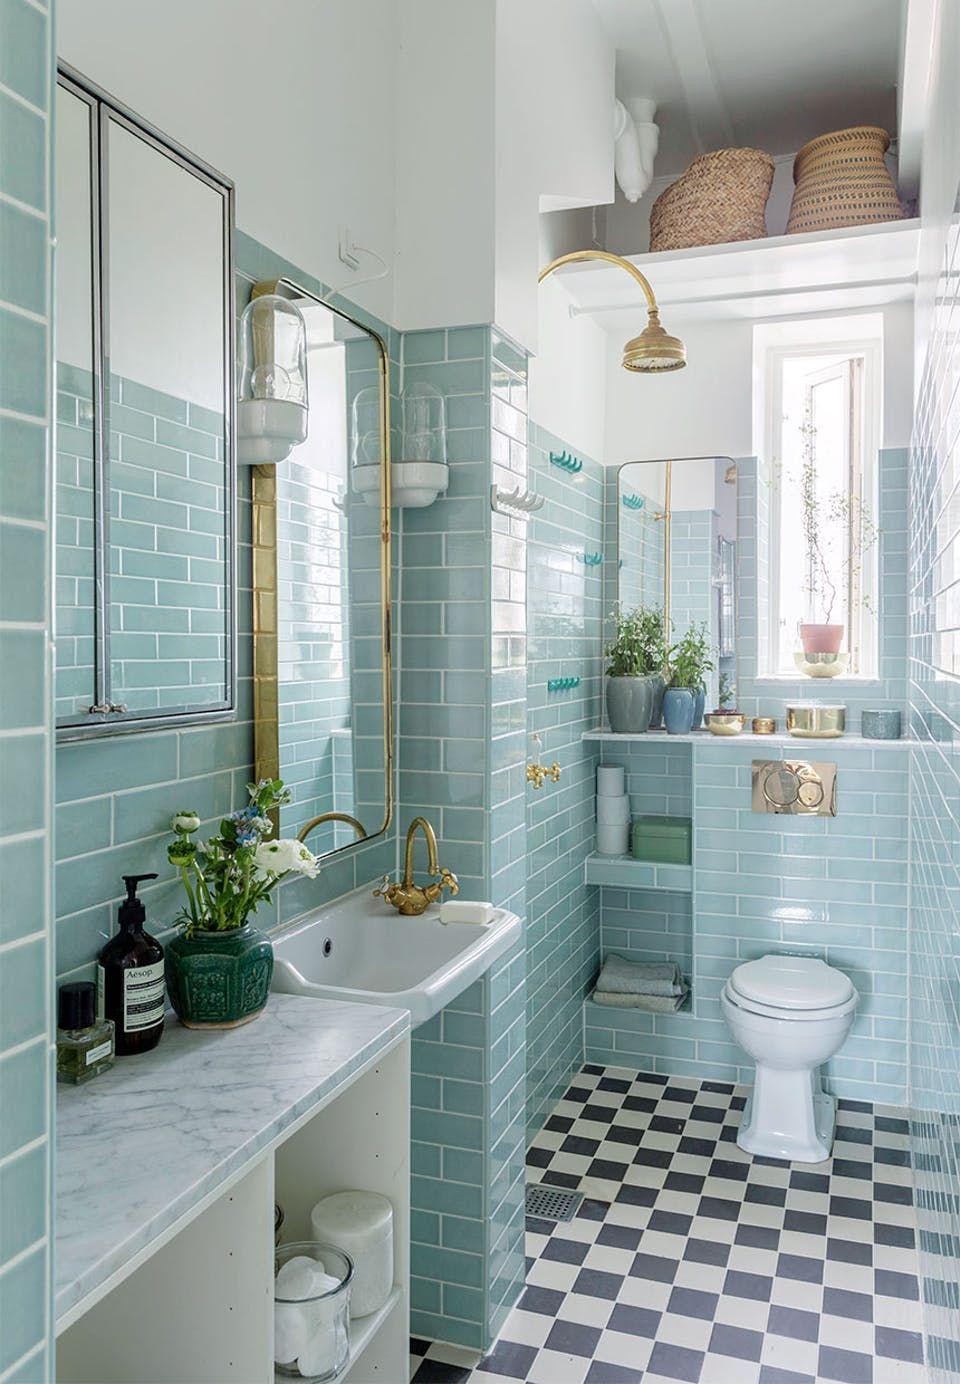 wall tile   bathroom   Pinterest   Toilet, Wall tiles and Bath